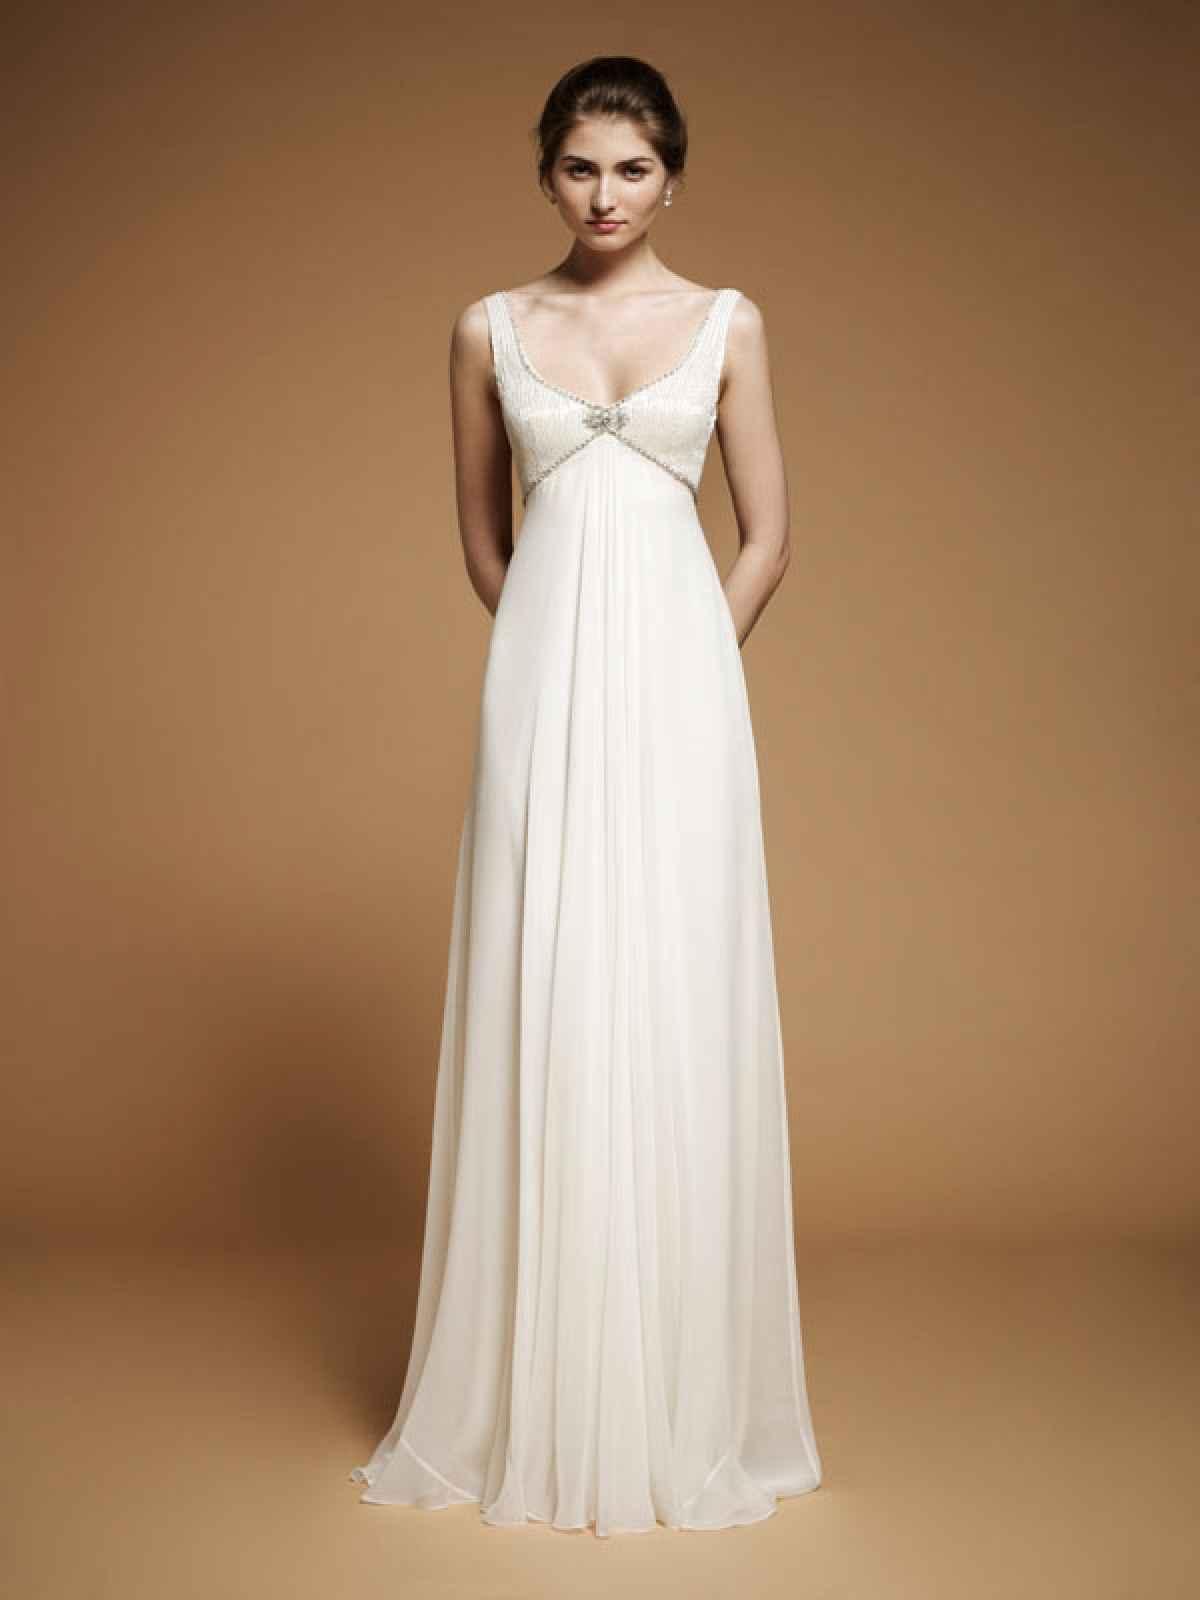 wedding dresses st.louis photo - 1